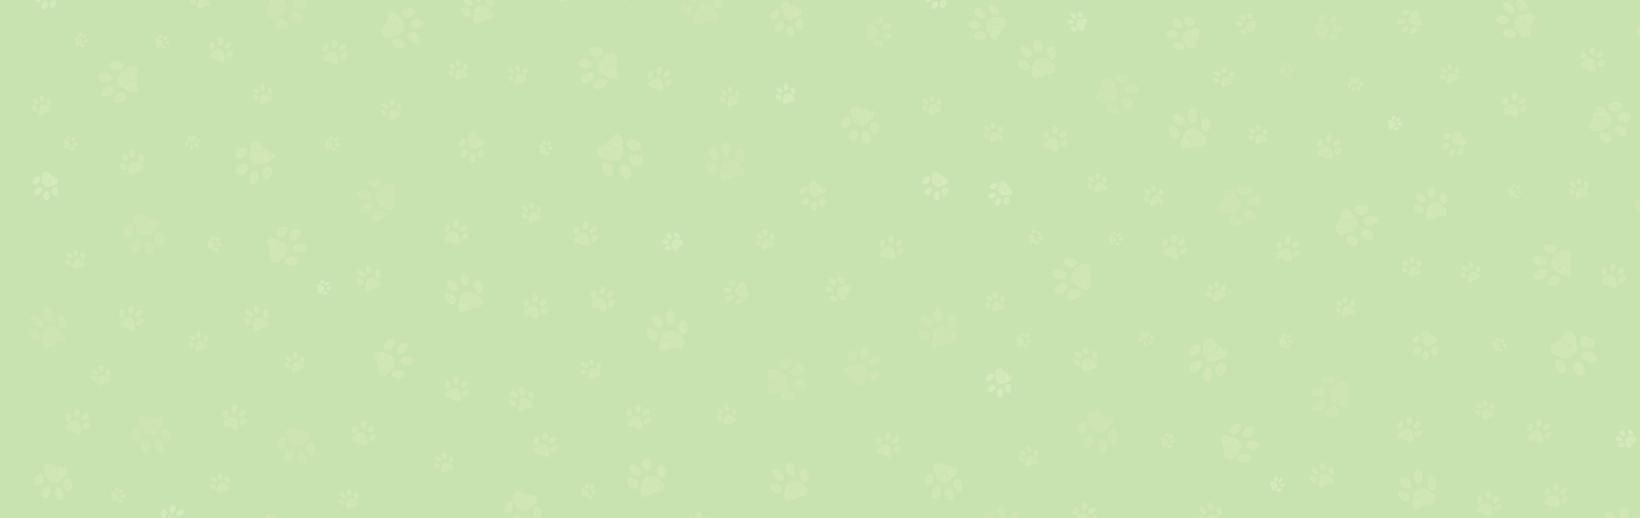 Green BG_paws_Short.png